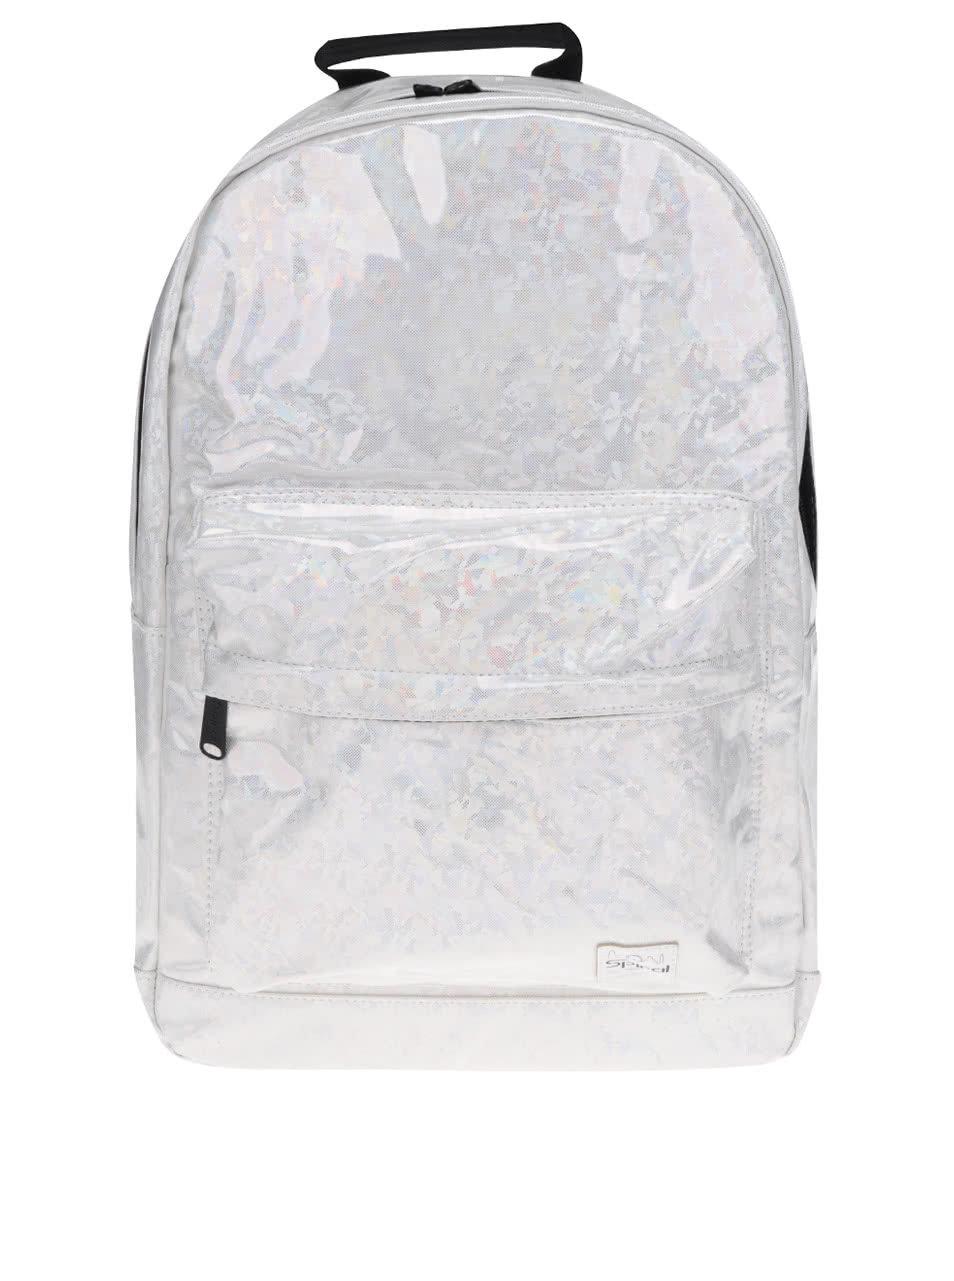 0f842d246ab Krémový dámský holografický batoh Spiral White Diamond 18 l ...